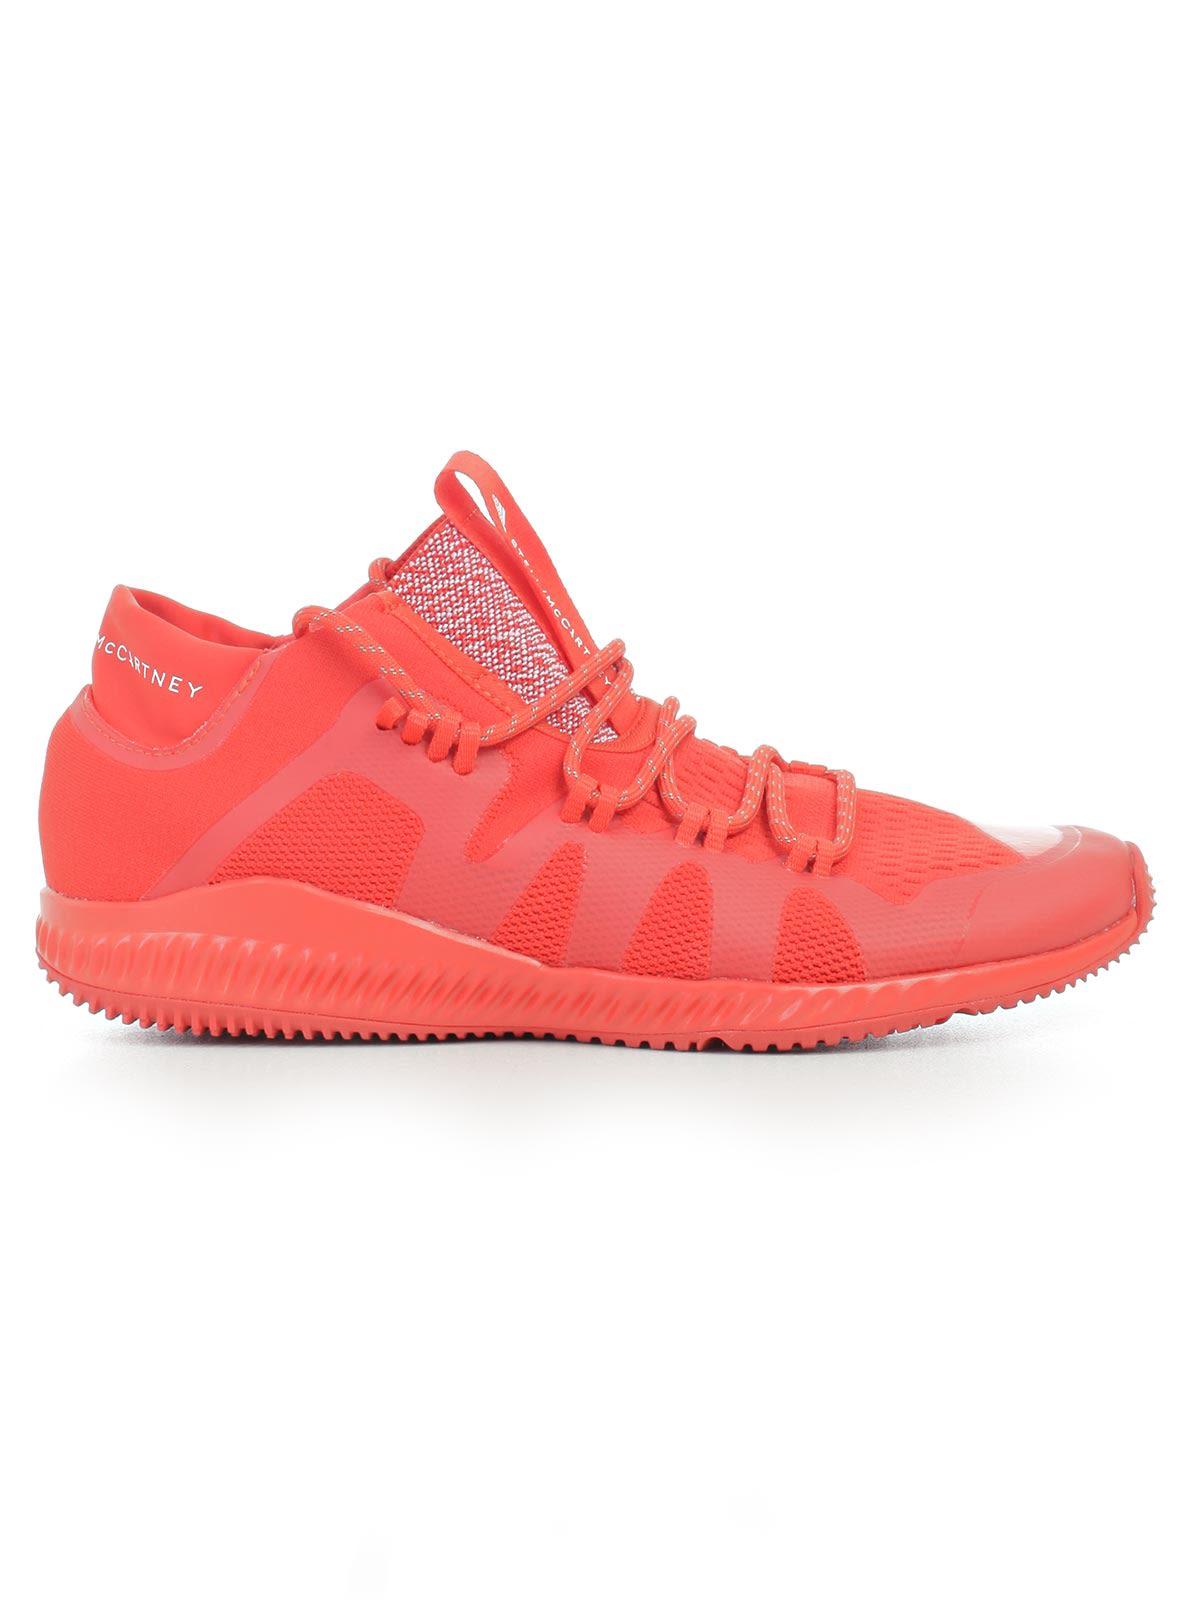 Adidas by Stella McCartney Shoes